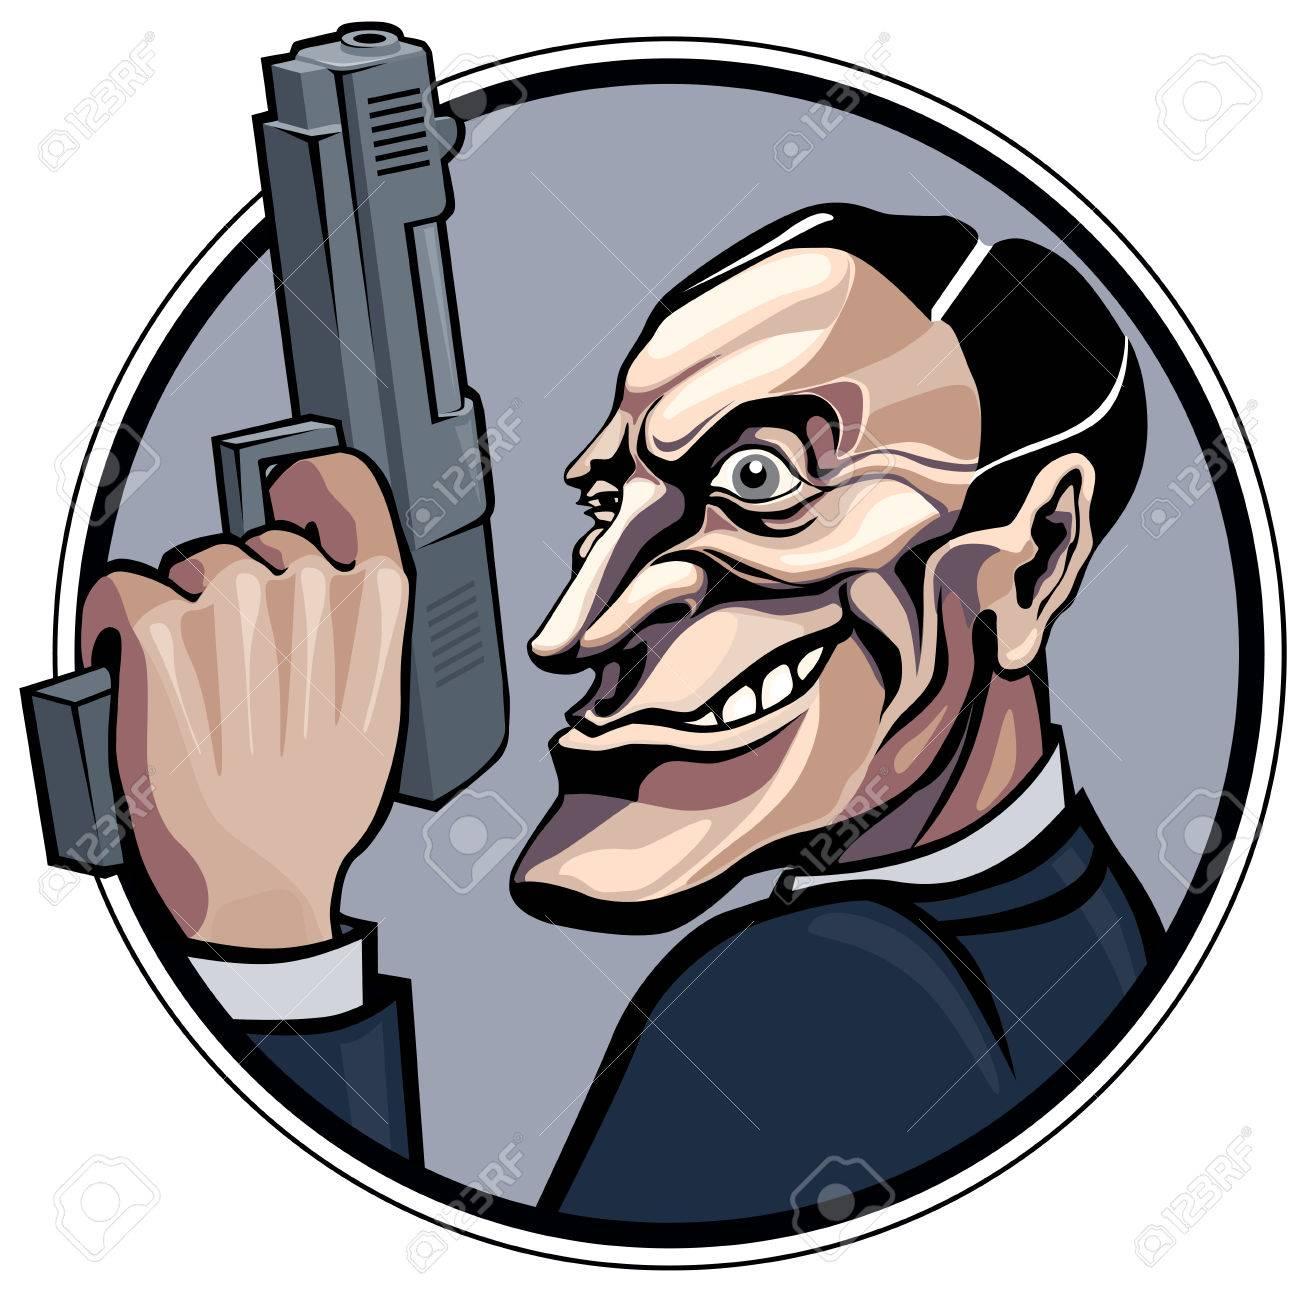 cartoon gangster with gun royalty free cliparts vectors and stock rh 123rf com Gangster Cartoon Characters gangster pictures cartoon characters